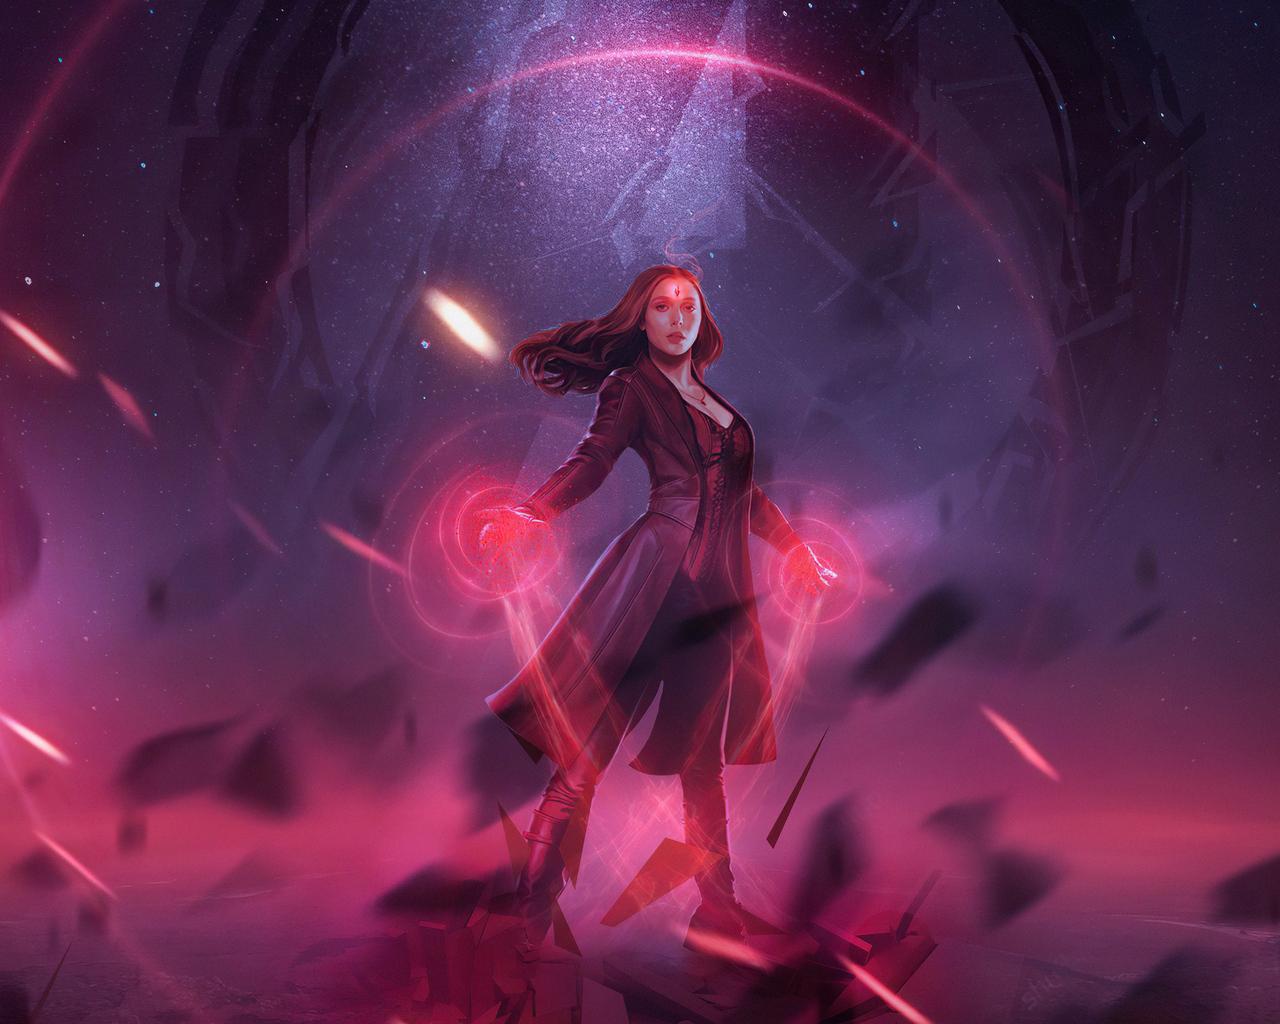 power-of-scarlet-witch-4k-nb.jpg